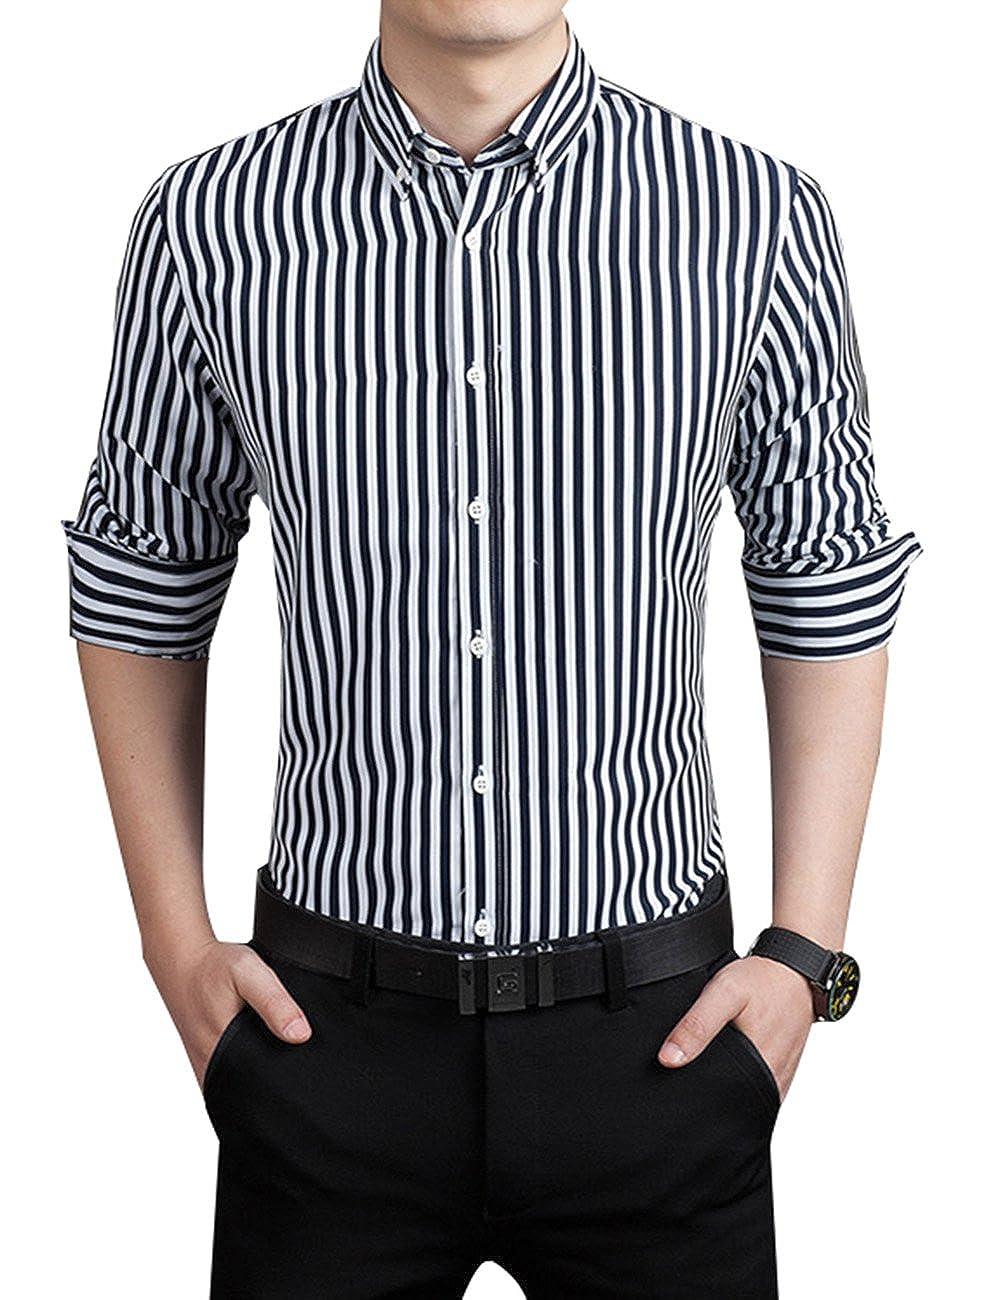 XI PENG Men's Casual Business Vertical Striped Button Down Long Sleeved Dress Shirts